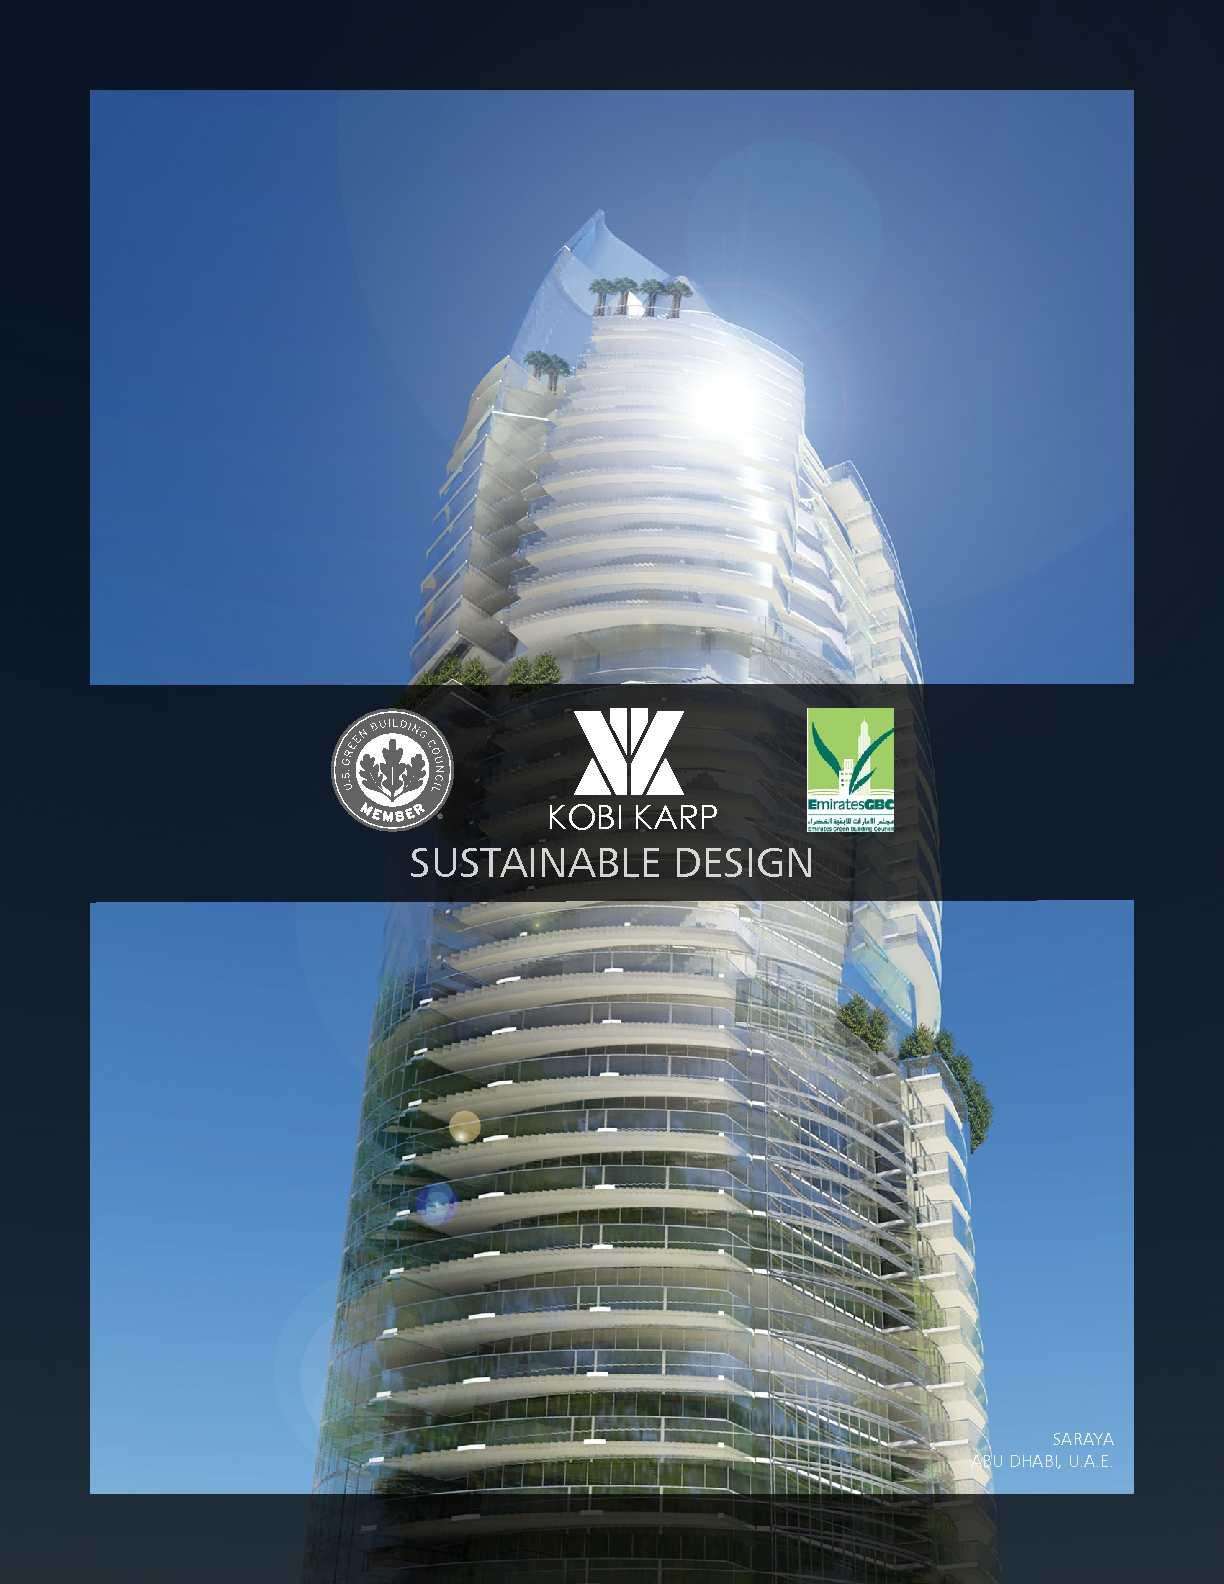 kobi karp architecture and interior design inc